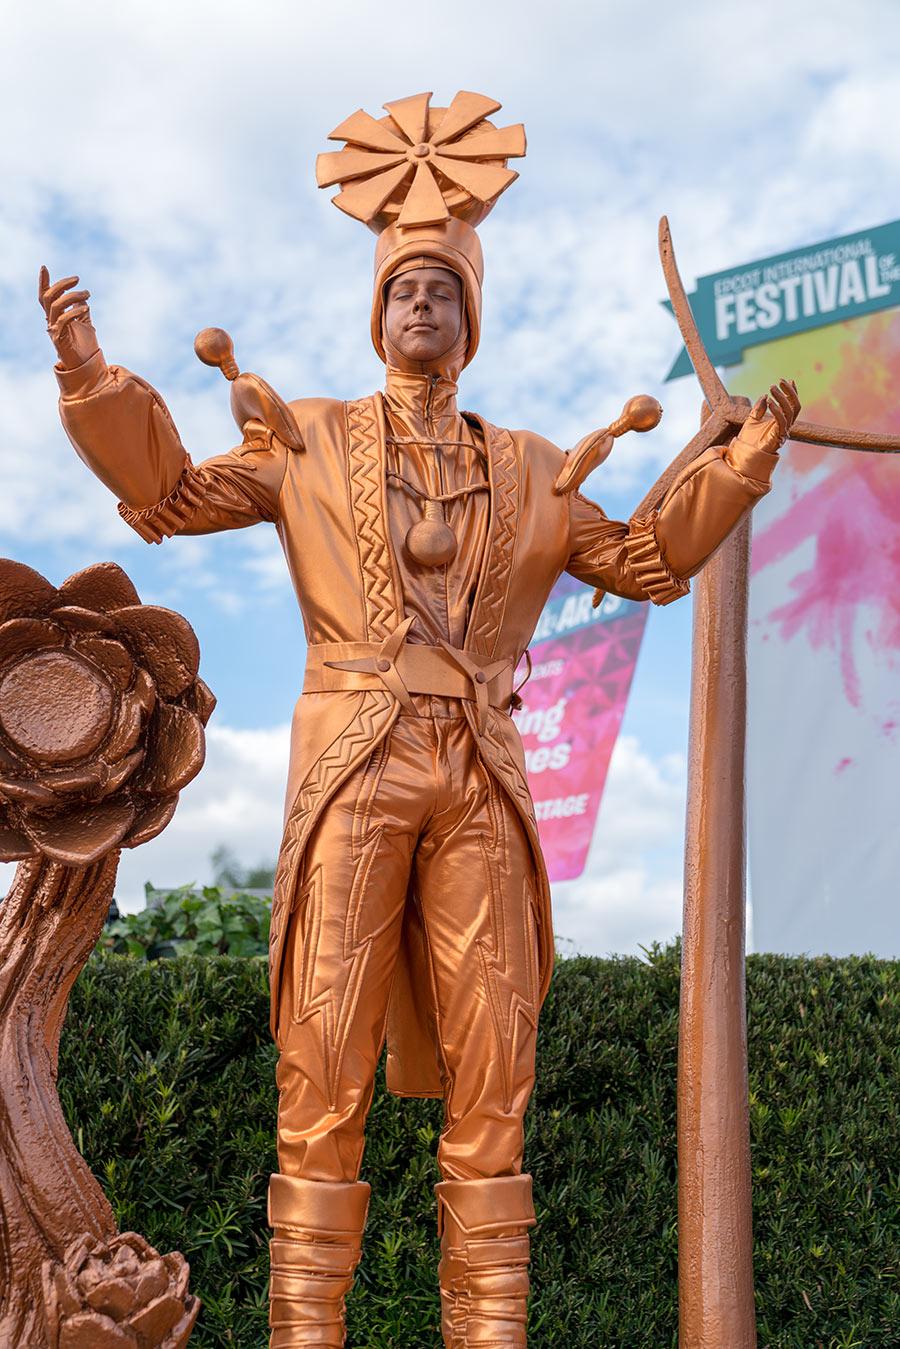 Living-Sculpture-1-Epcot-International-Festival-of-the-Arts-2018.jpg